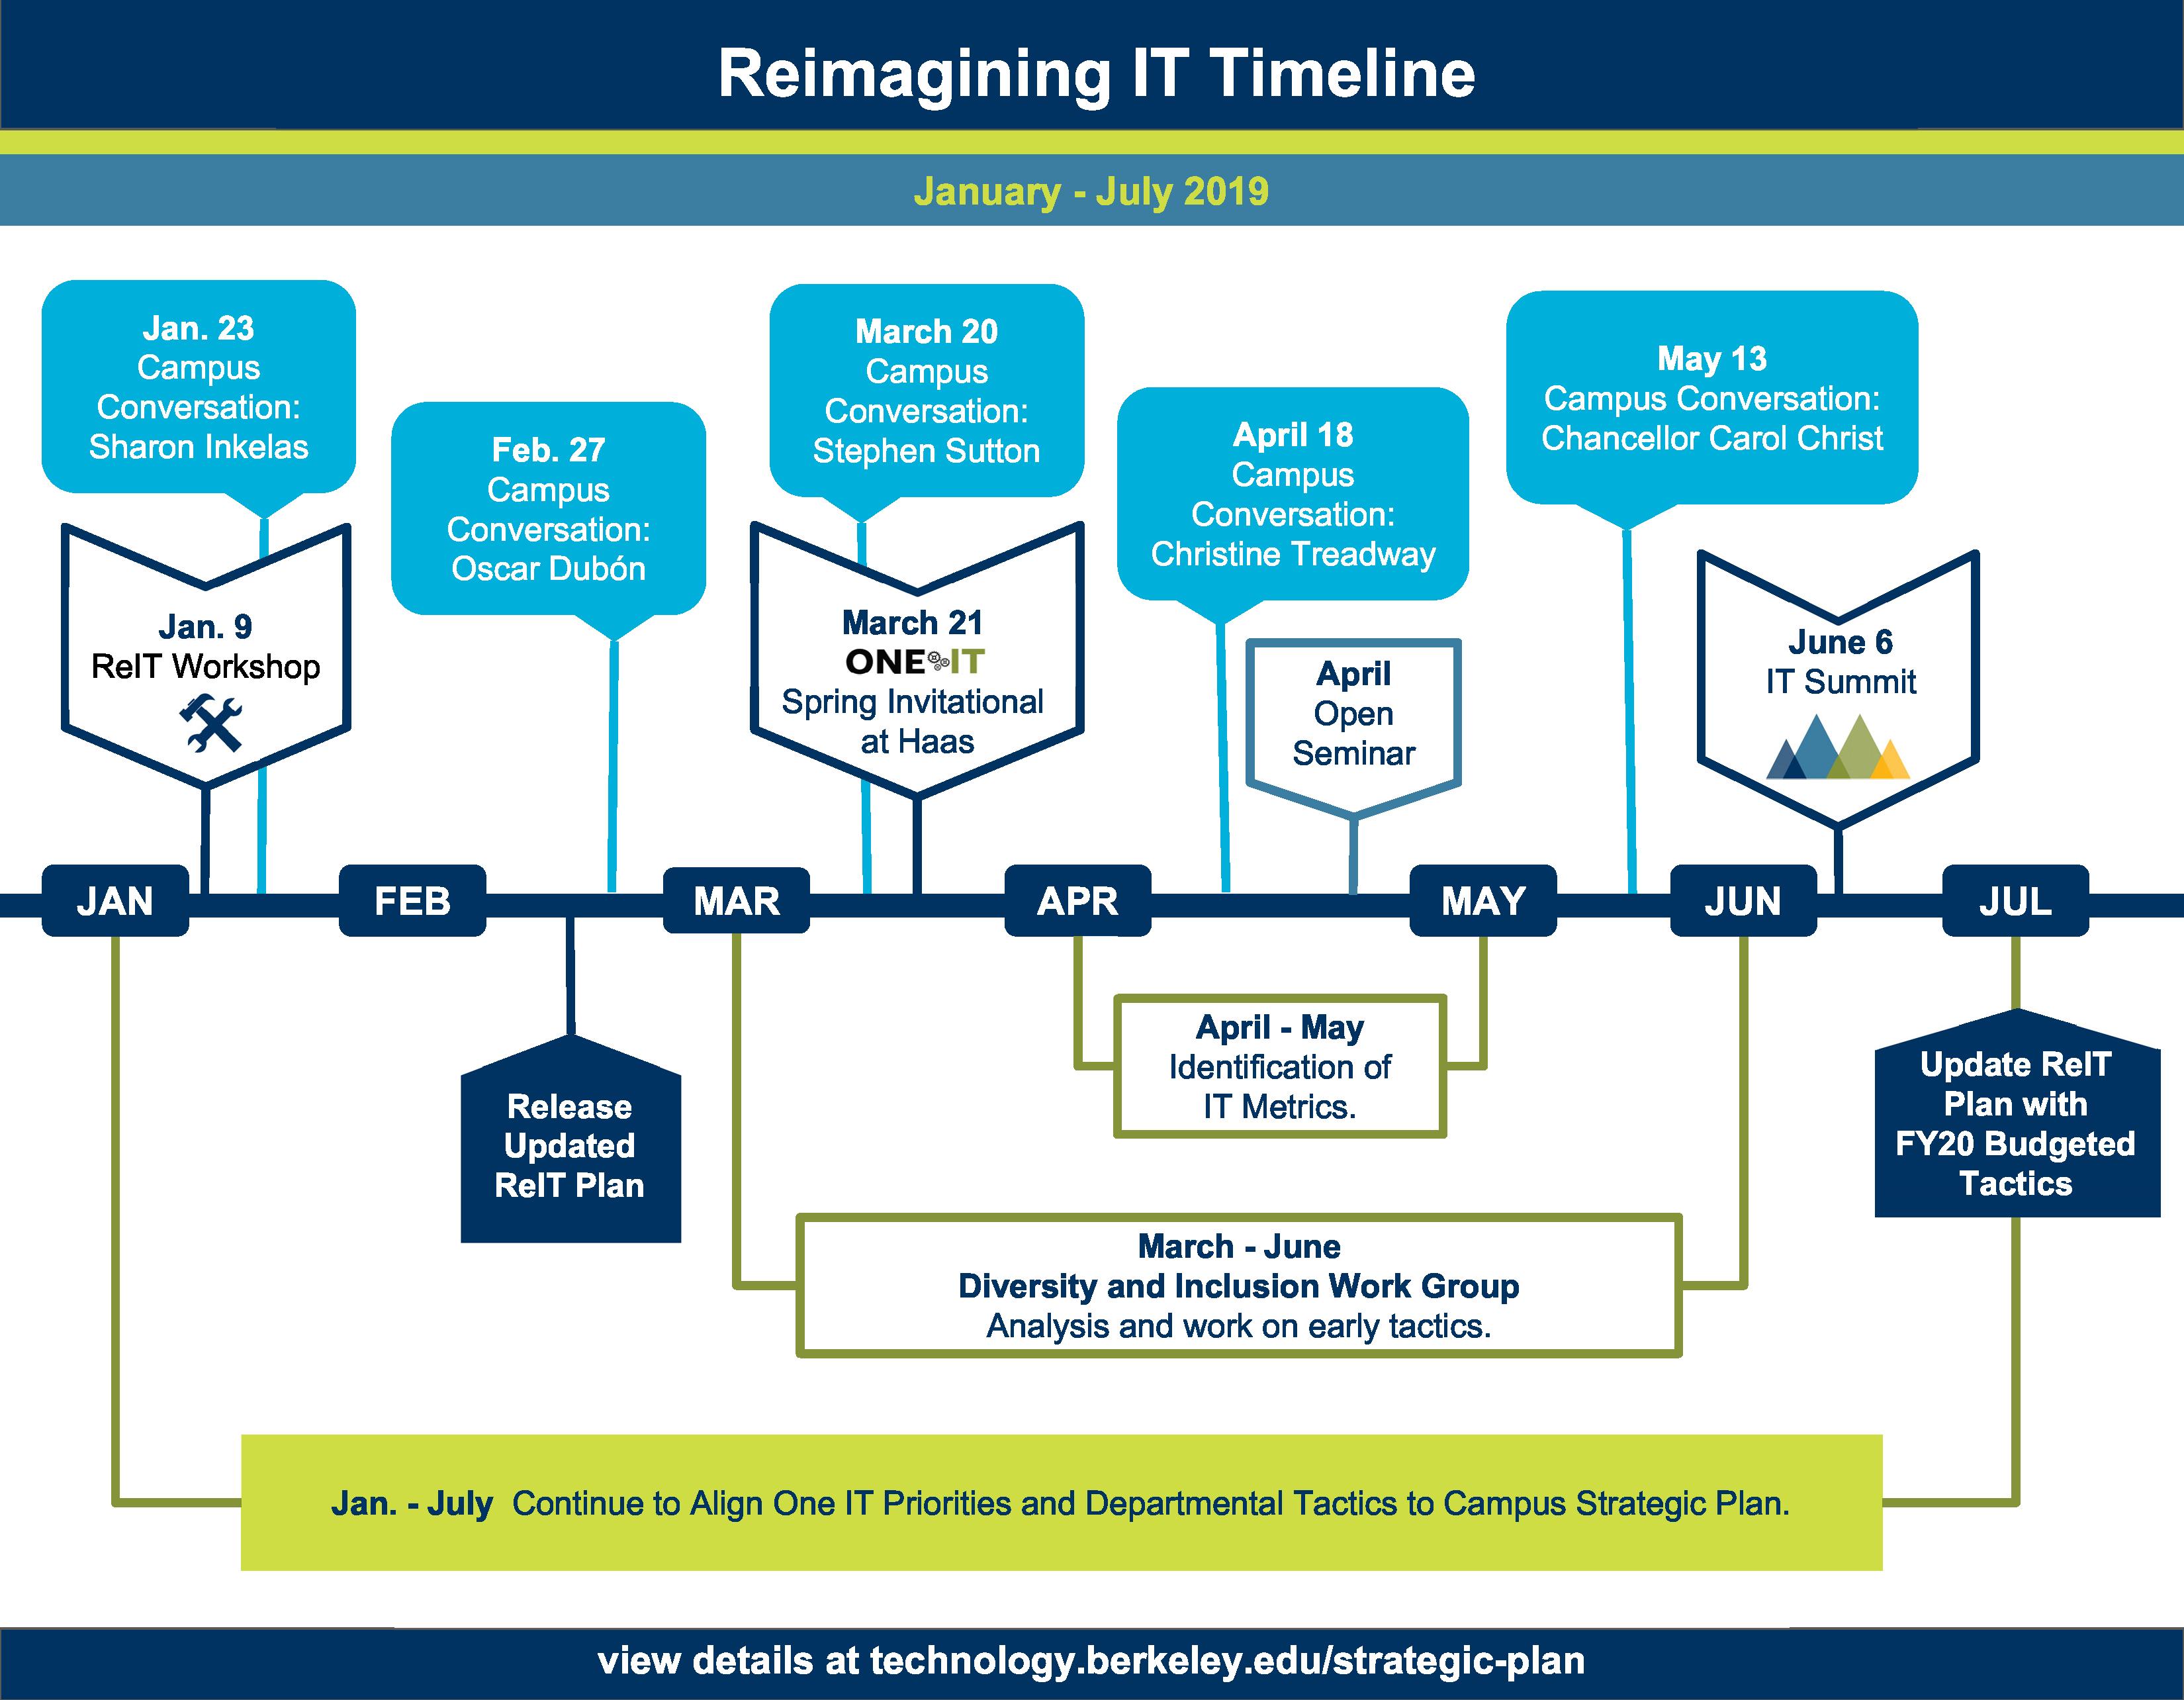 ReIT Timeline Jan to July 2019